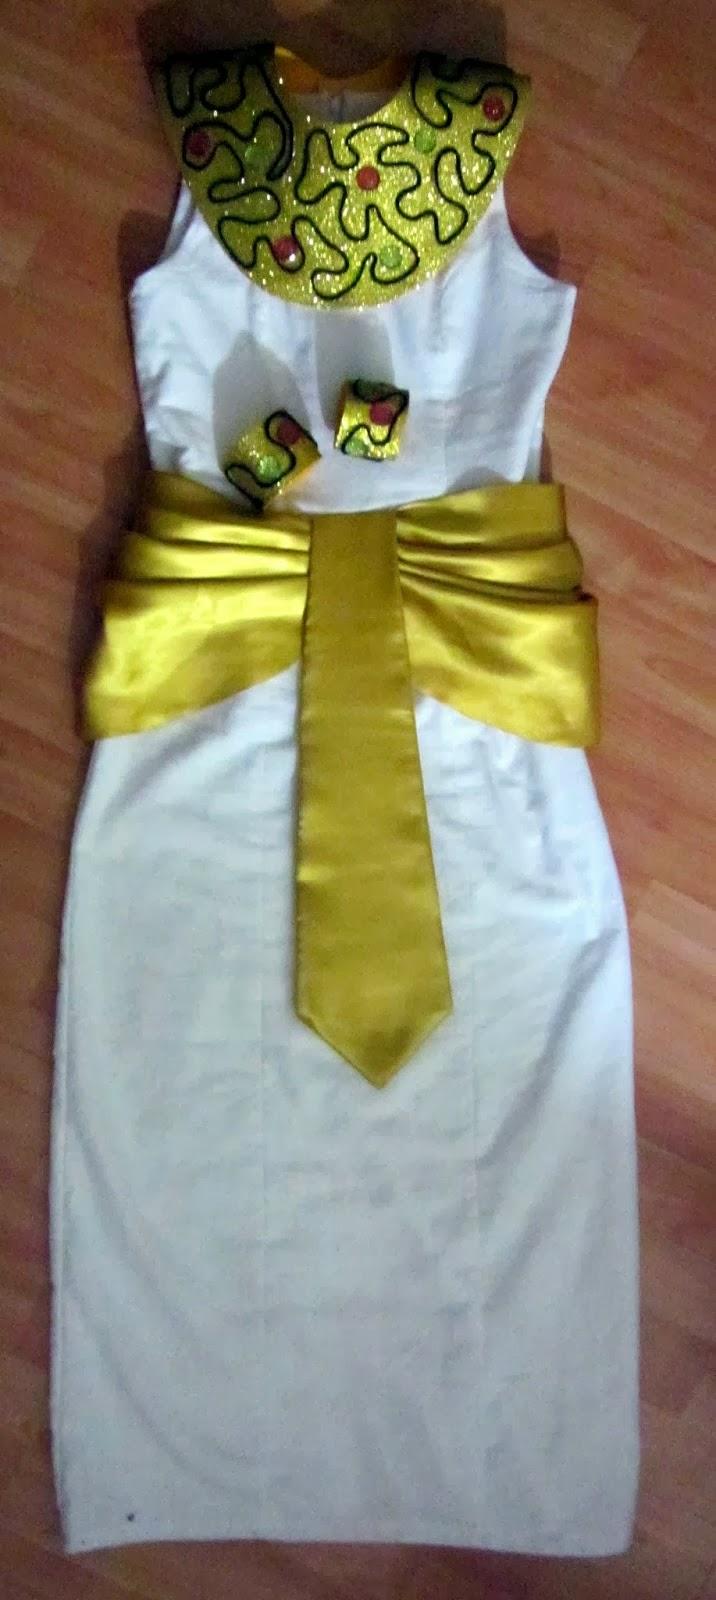 Baño Turco Definicion:Hacer Un Disfraz De Mazorca De Maiz Facil